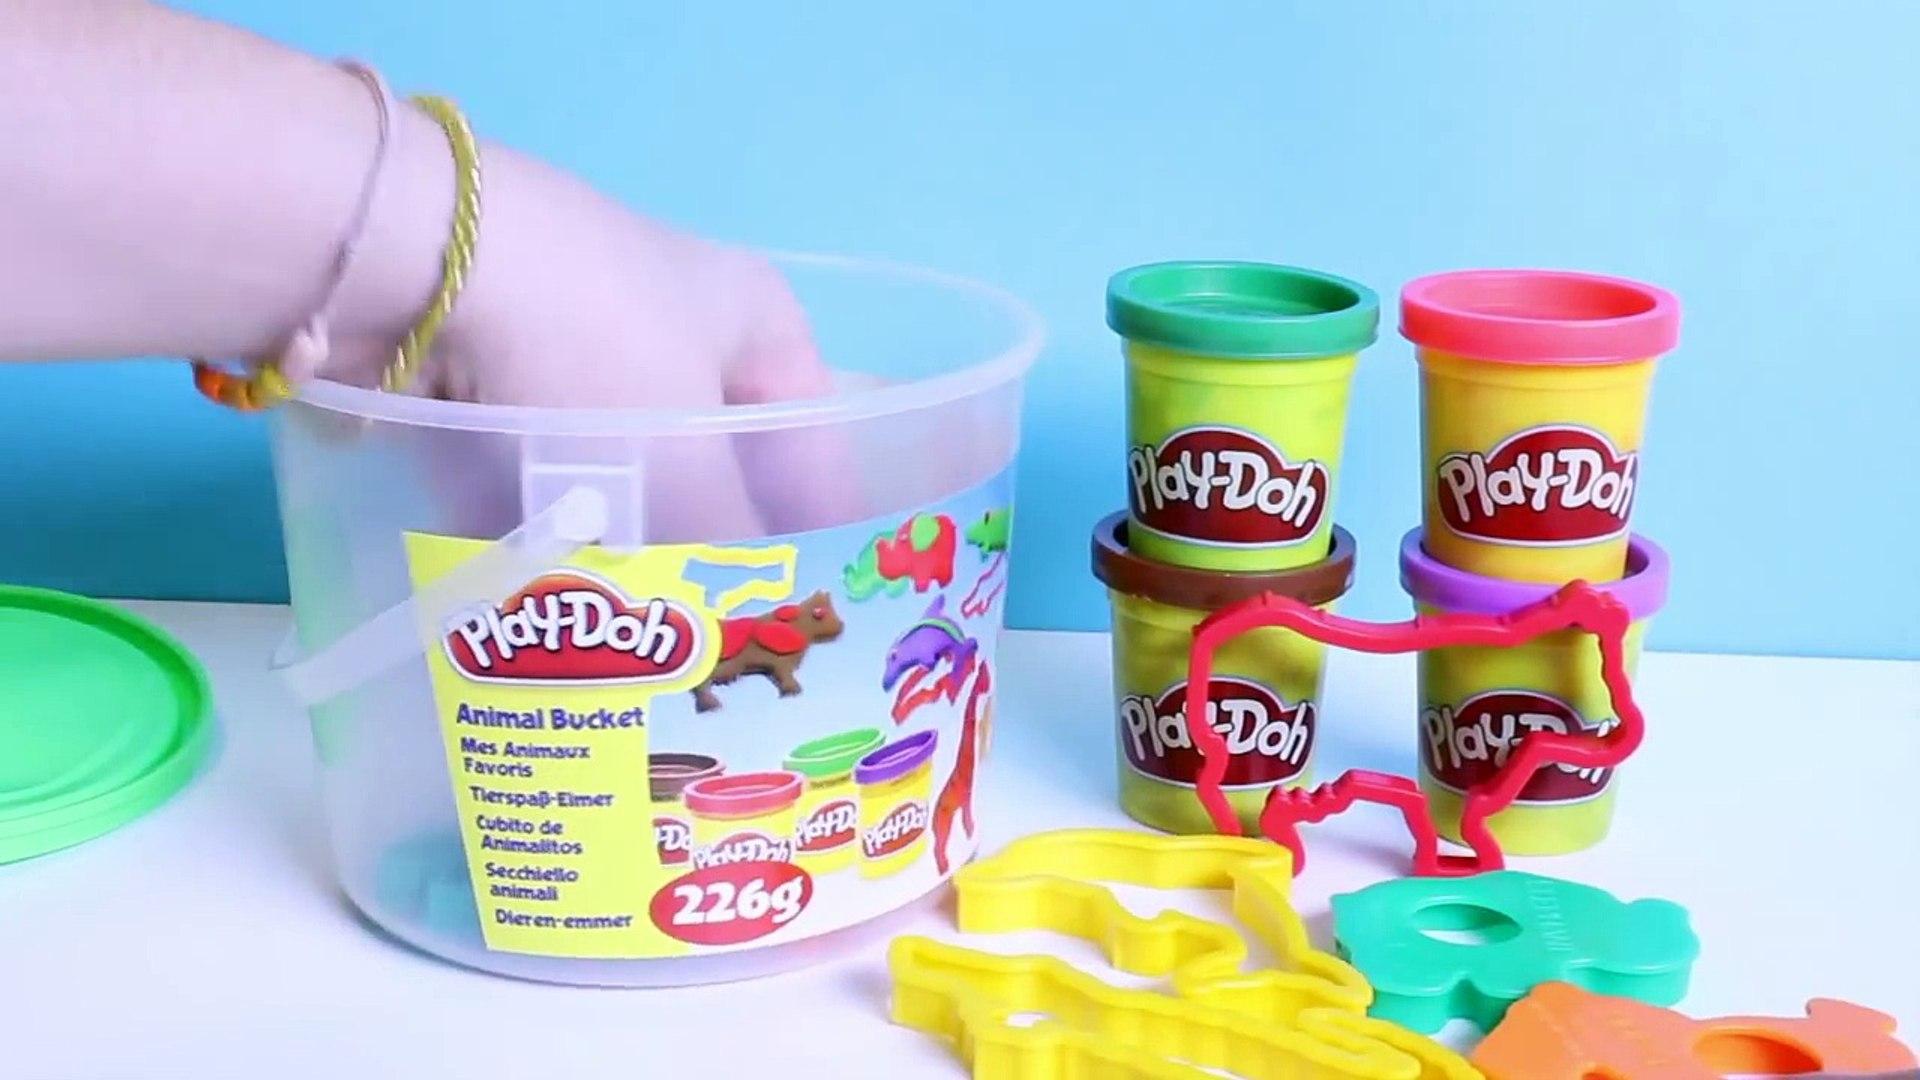 Play Doh Animals Activities Bucket Play-Doh Animals Shapes & Molds Play Farm Jungle Animals